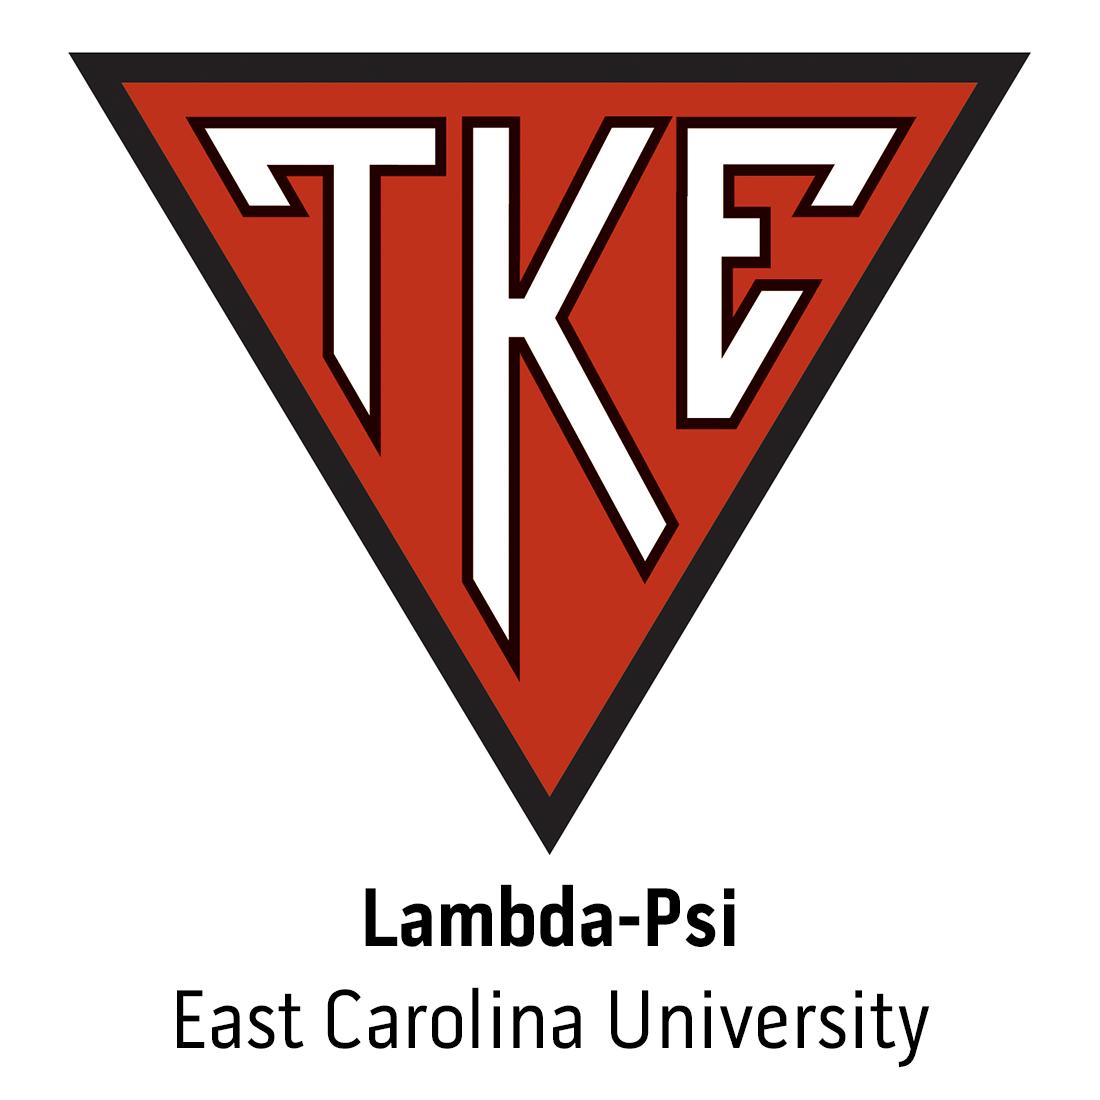 Lambda-Psi C at East Carolina University